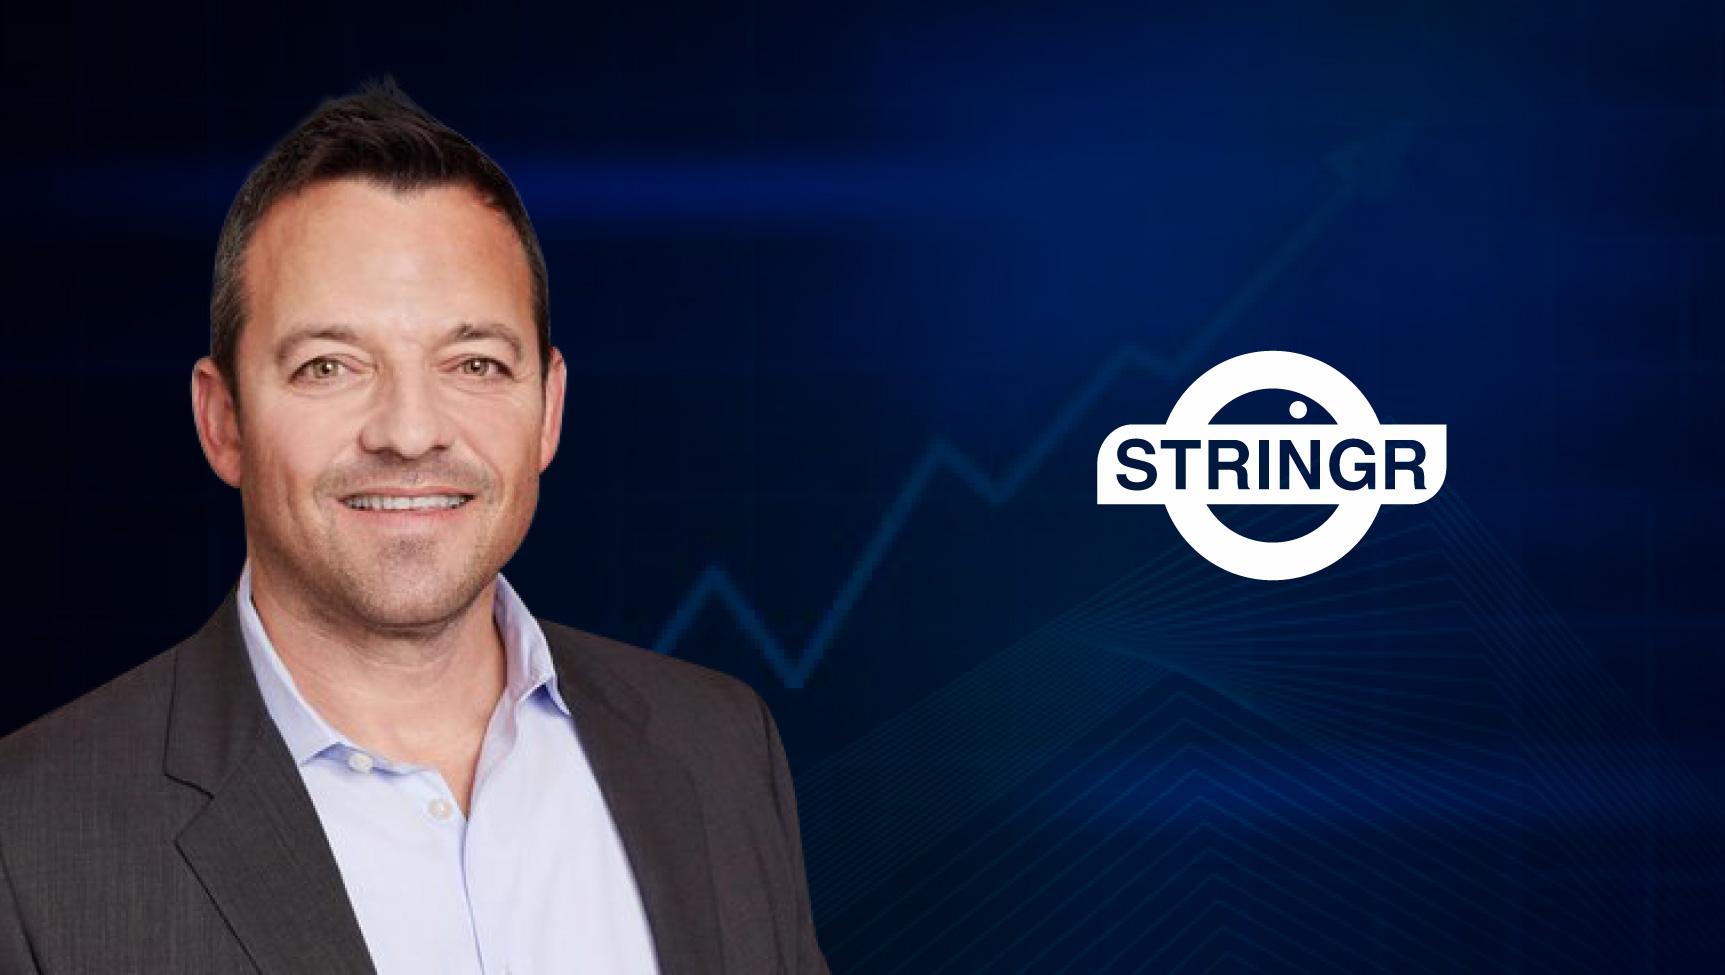 SalesTech Interview with Drew Berkowitz, SVP of Sales at Stringr